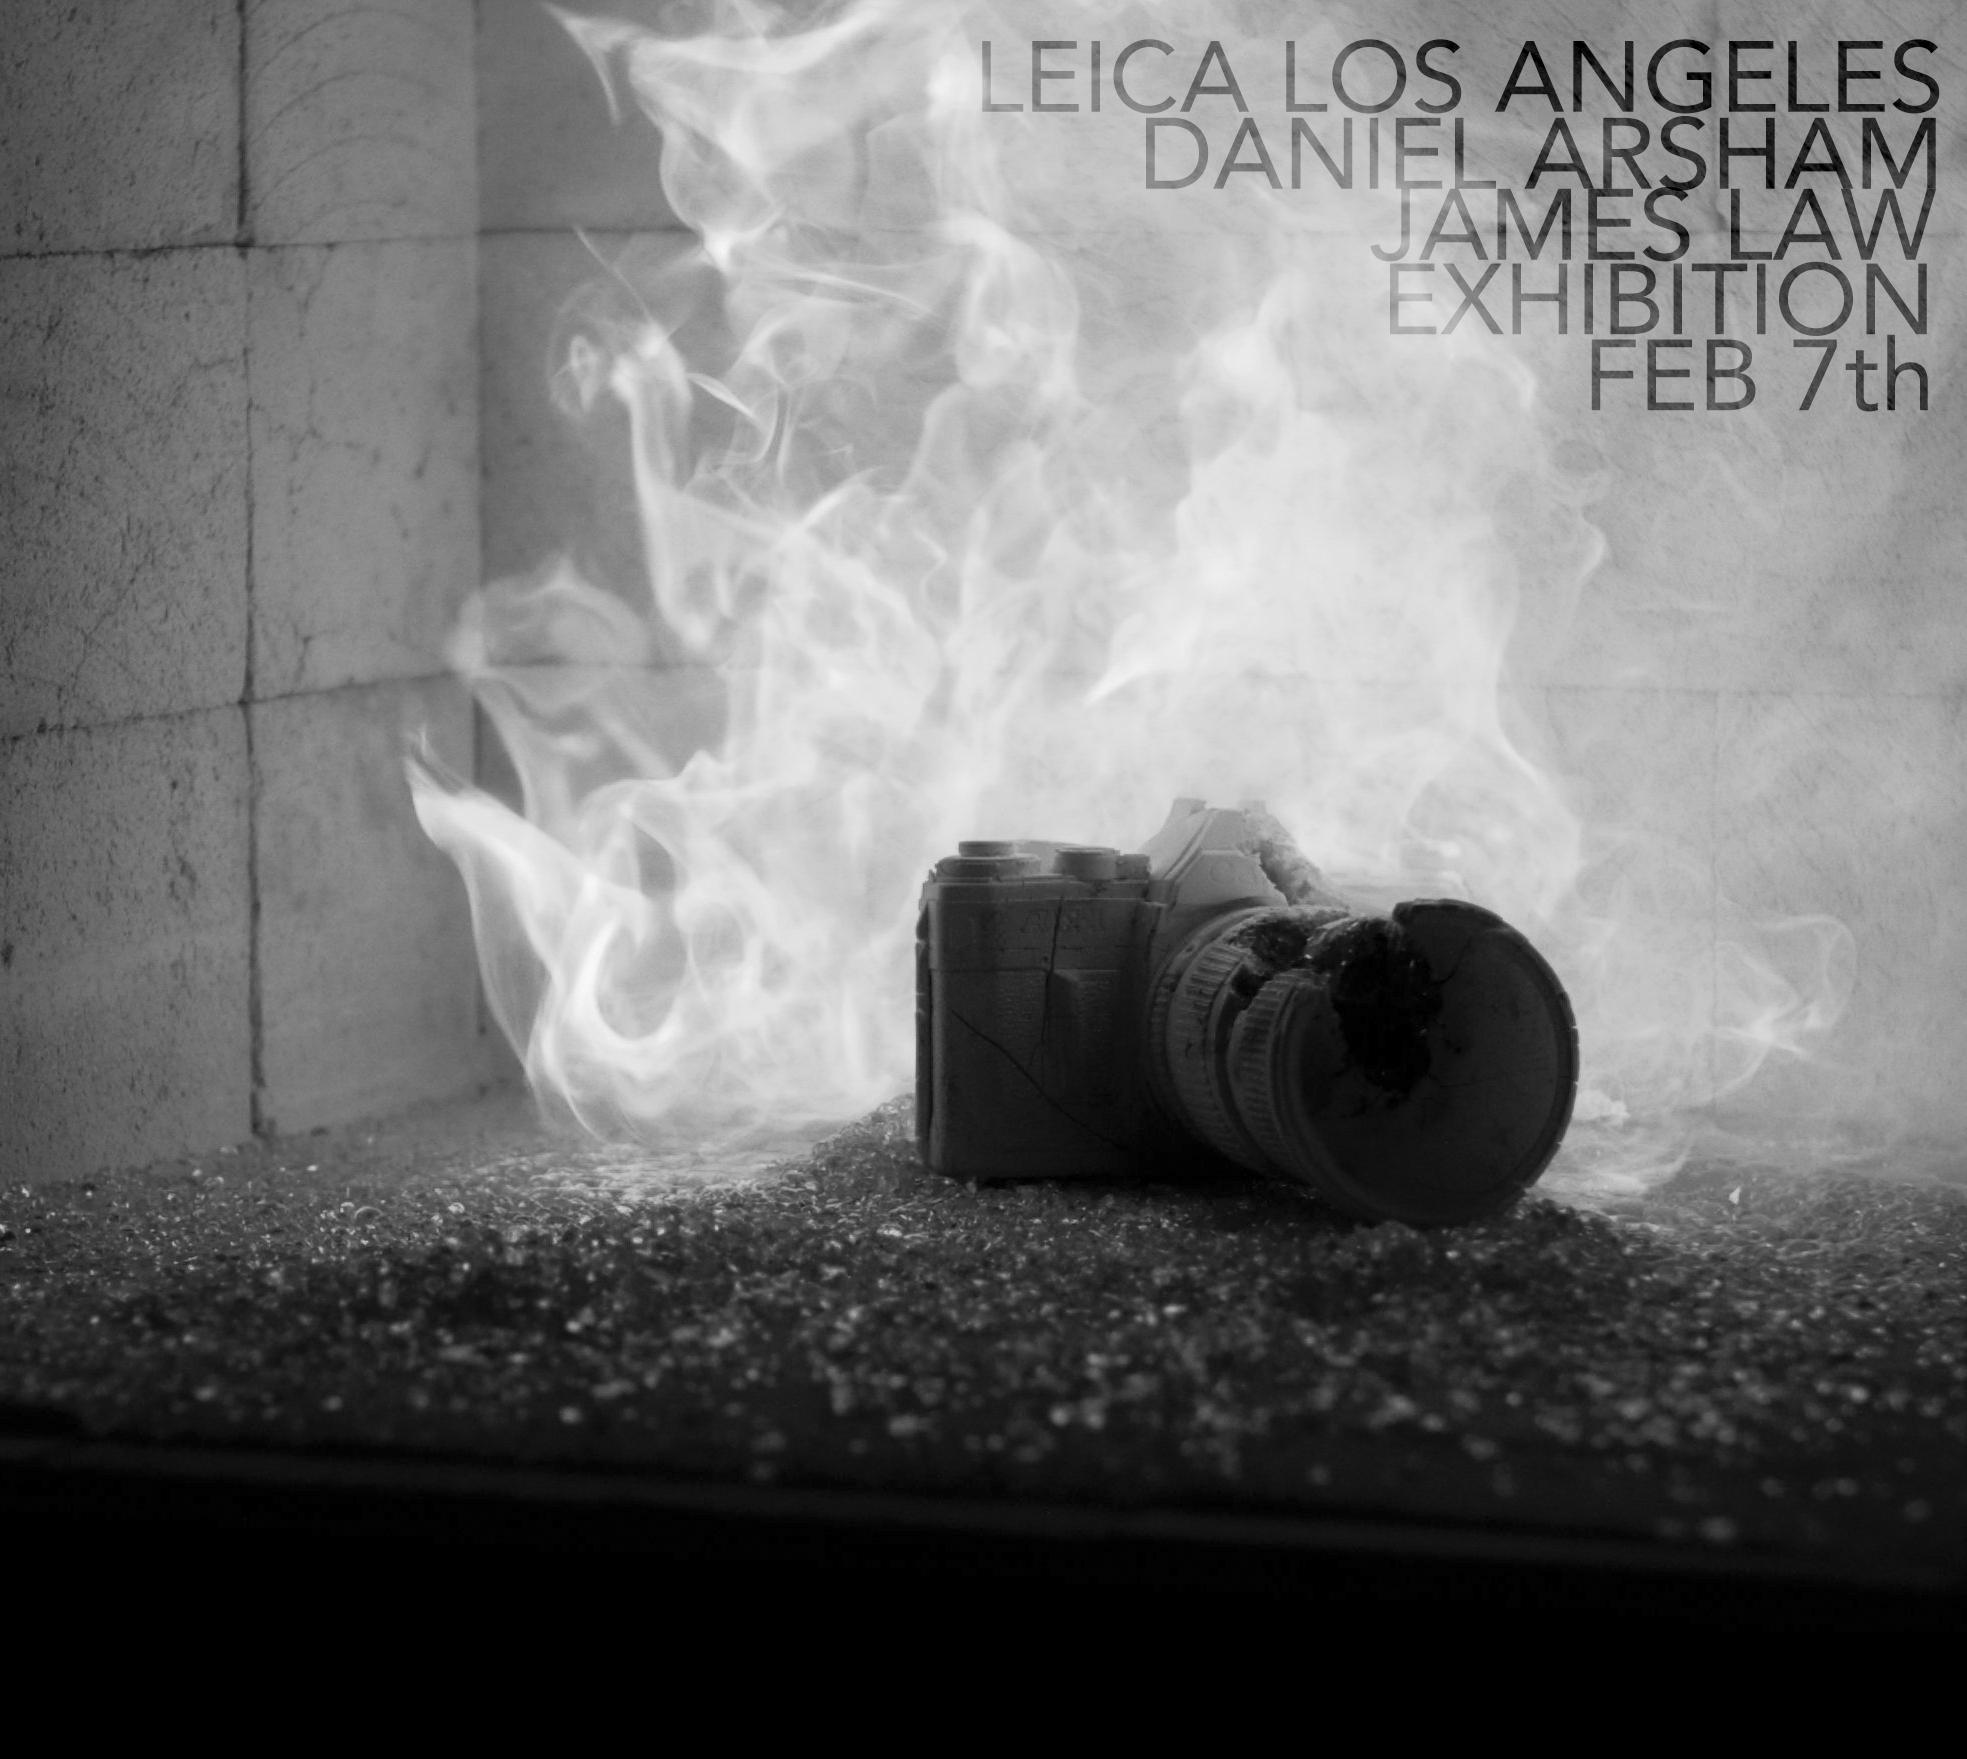 James Law Leica invitation.jpg